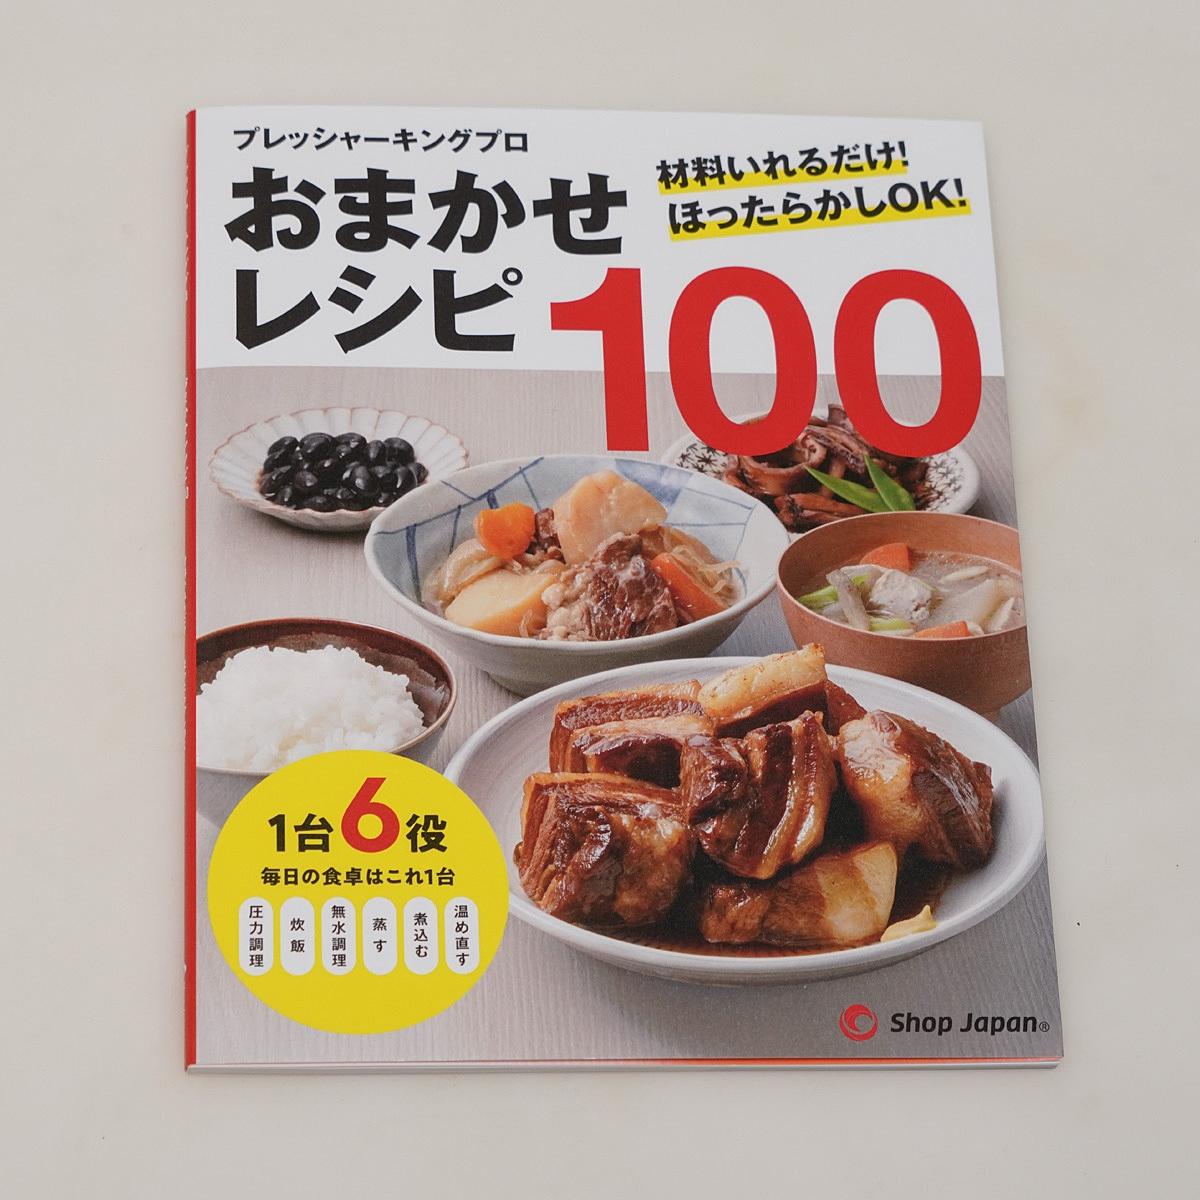 Shop Japan(ショップジャパン)プレッシャーキングプロを使った竹千代55さんのクチコミ画像3